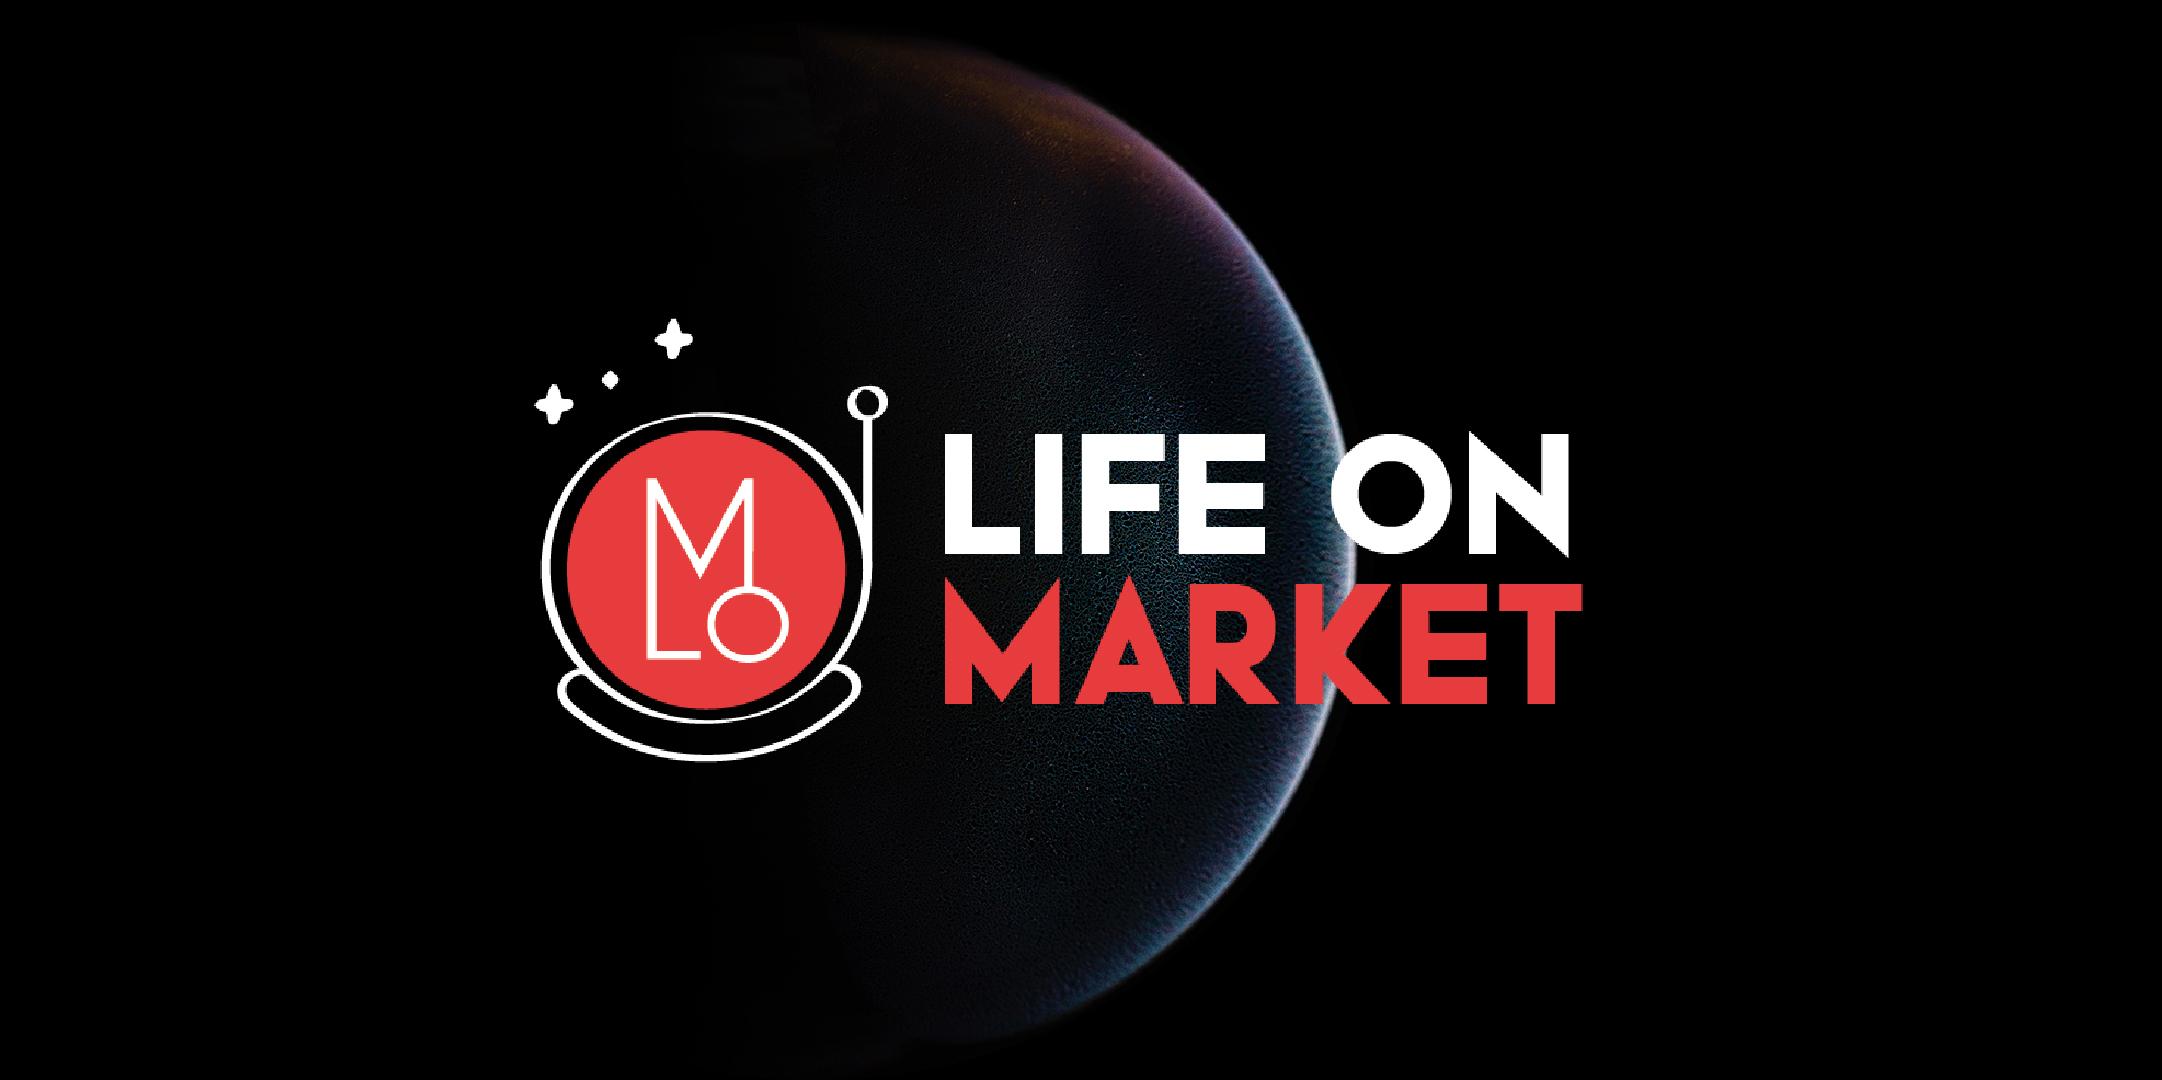 life on market